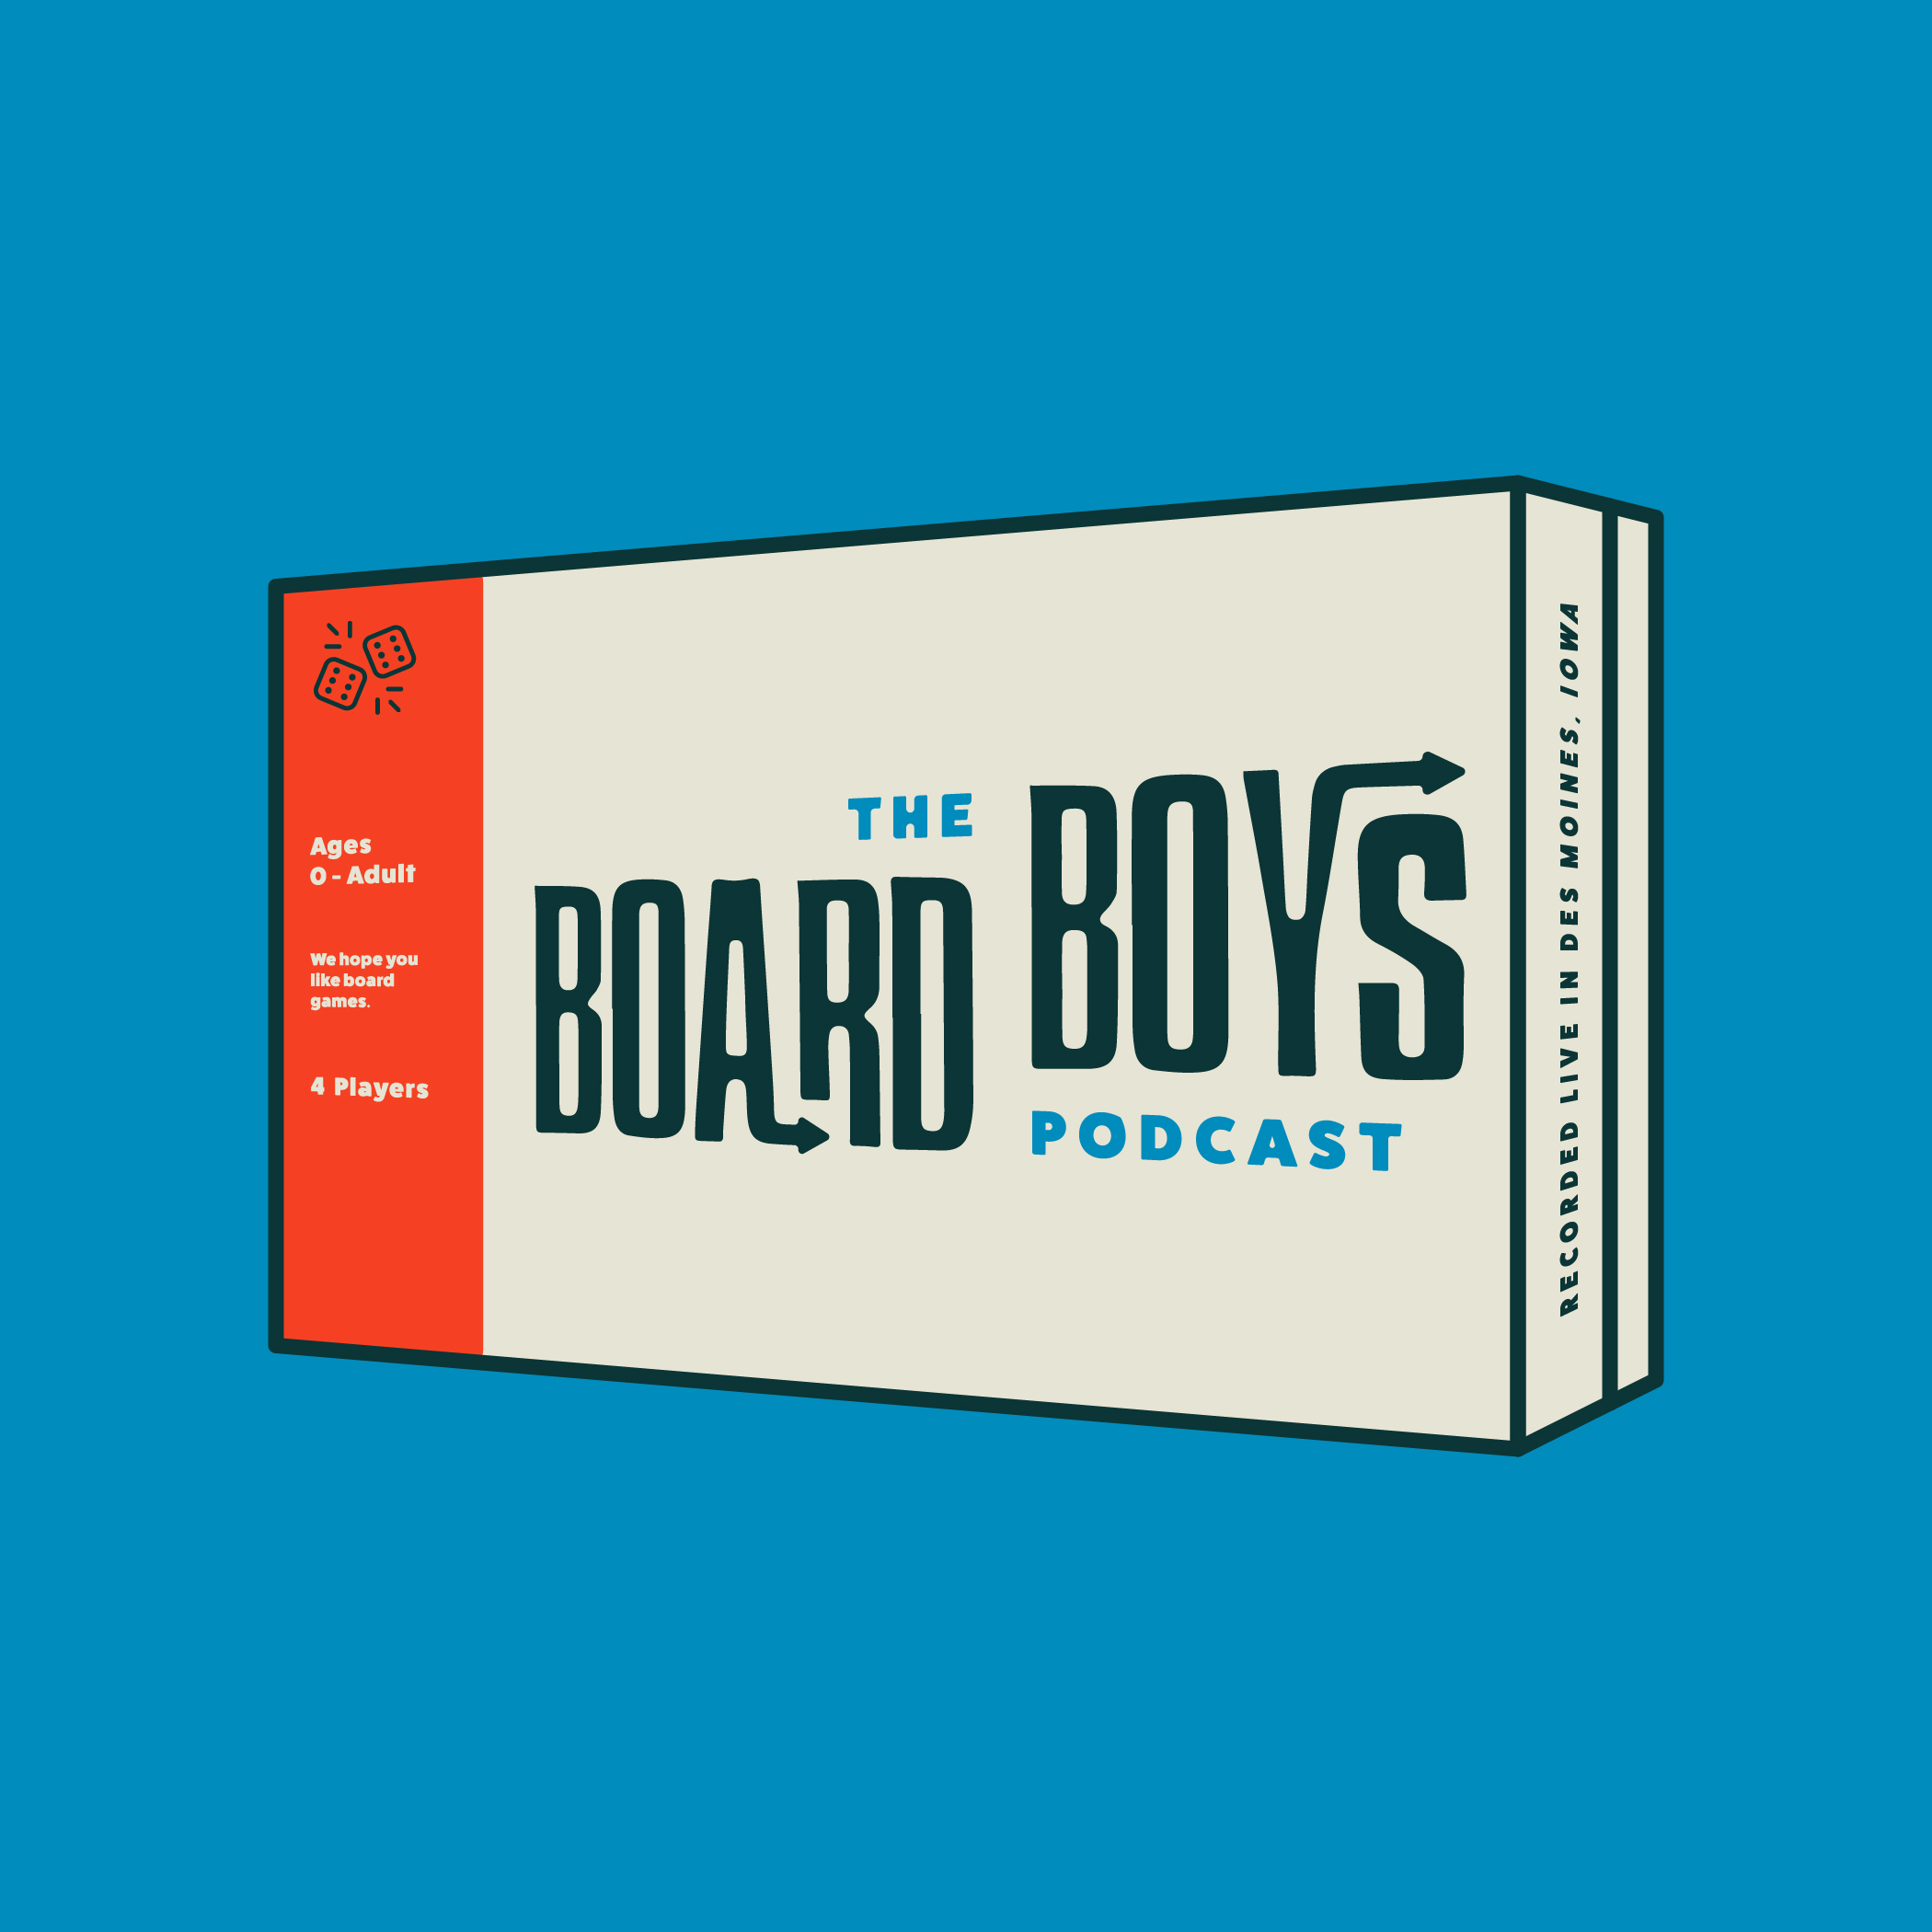 The Board Boys Podcast show art